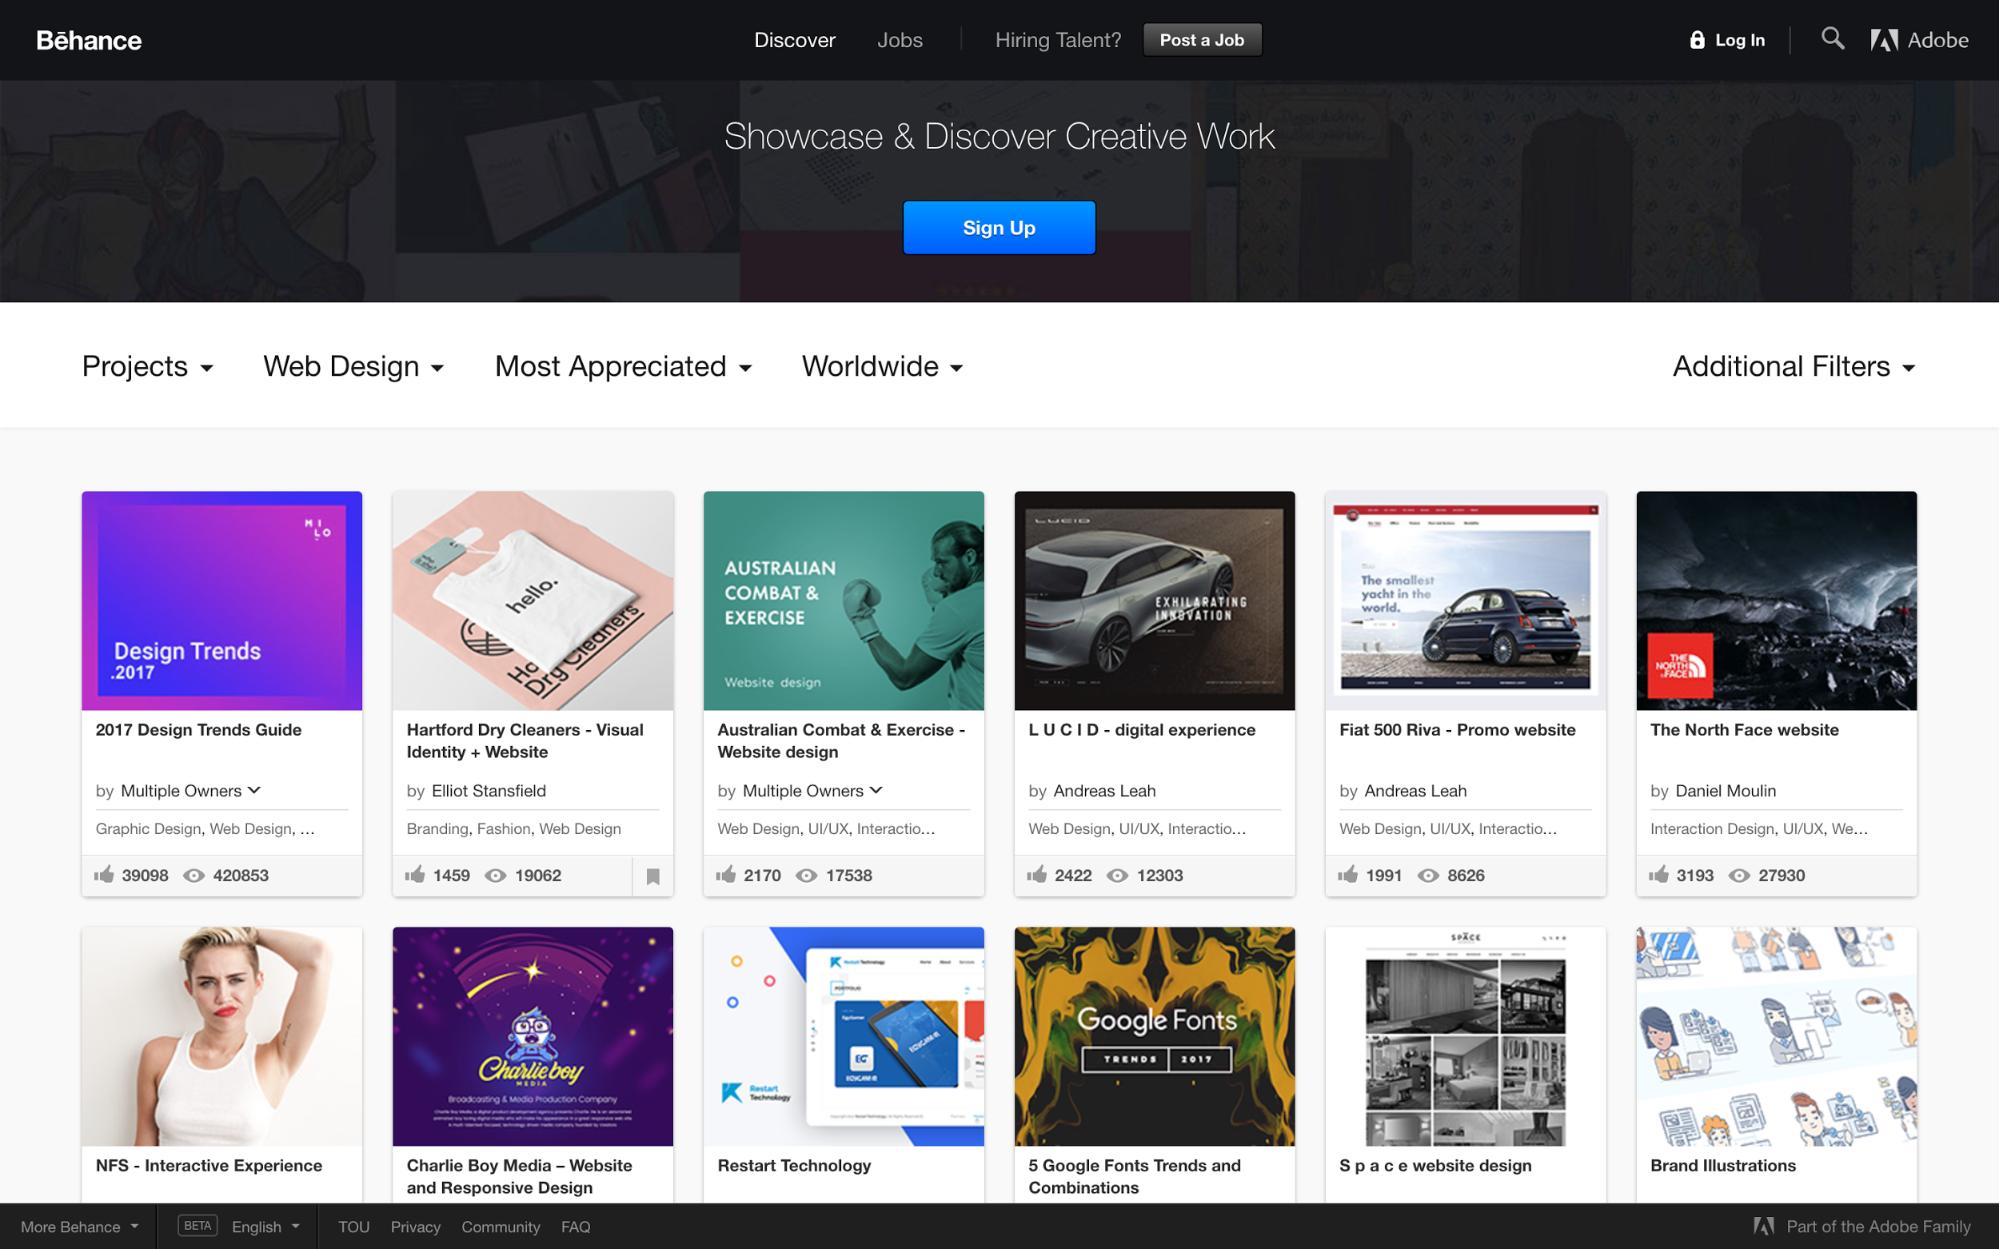 17 amazing sources of web design inspiration | Webflow Blog